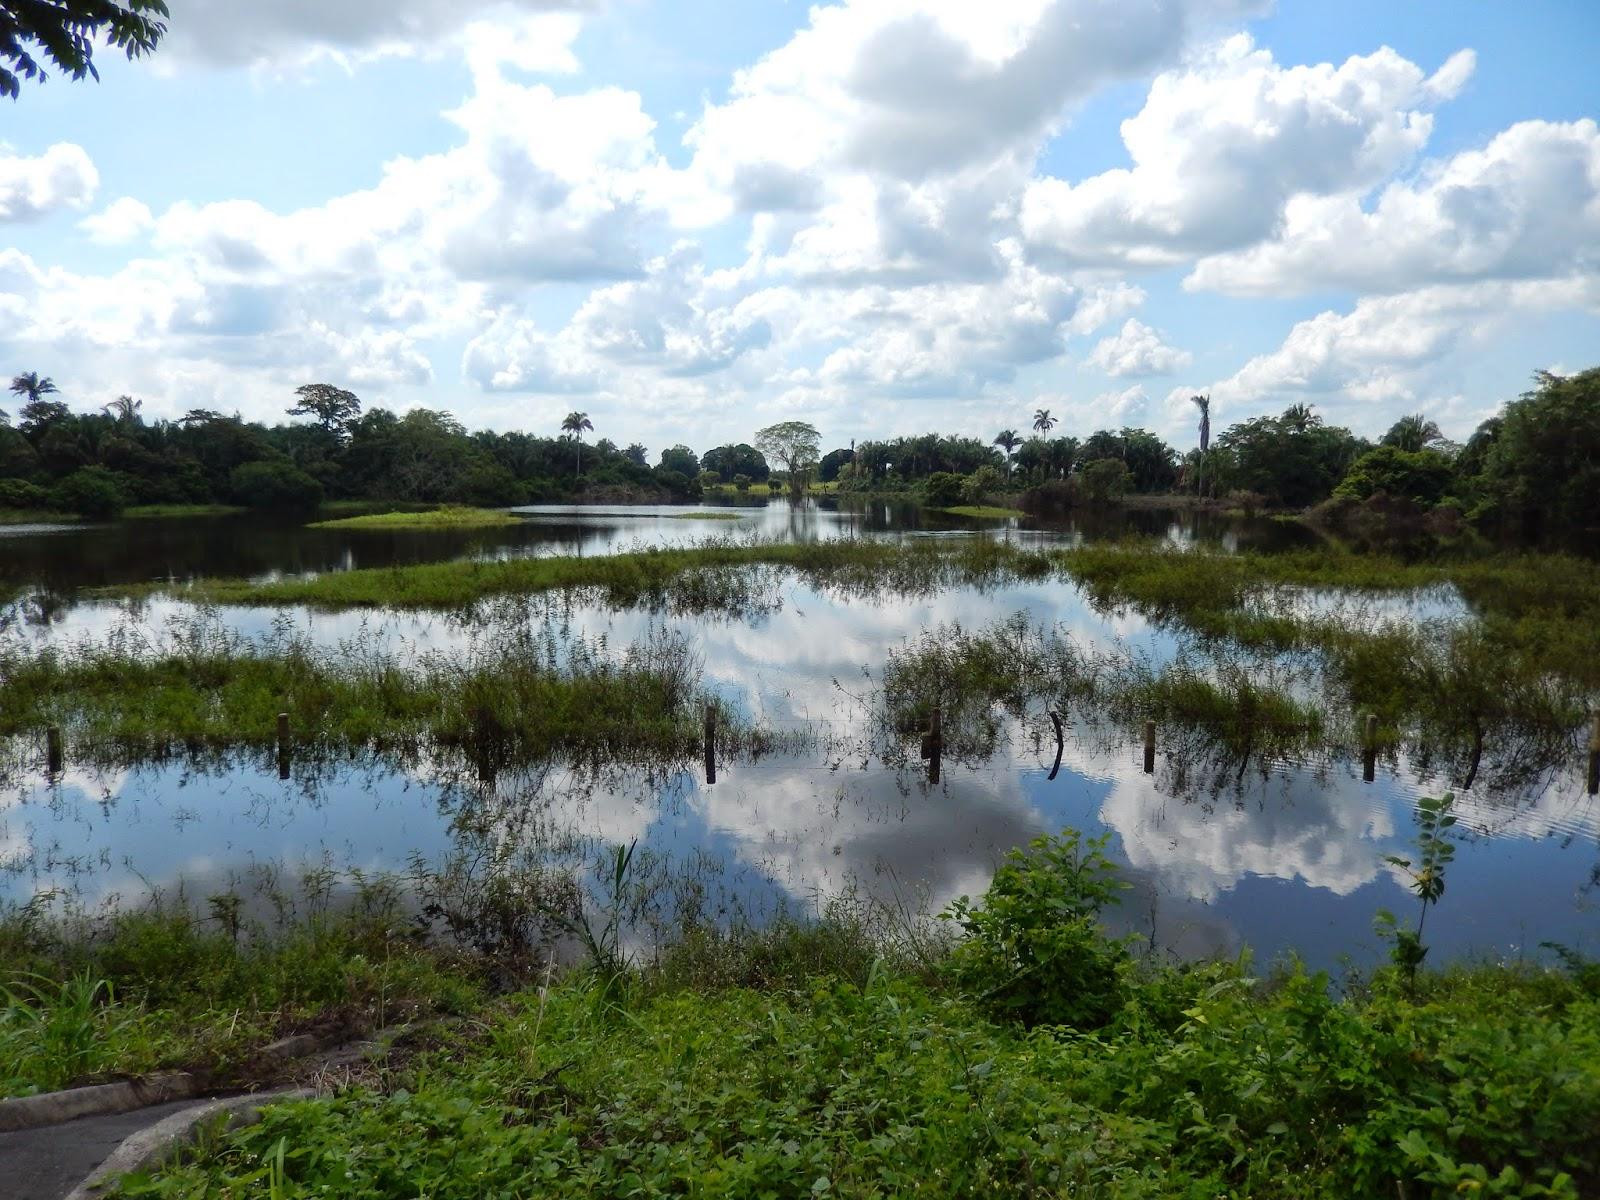 Tabasco, inundado, campos, mexico